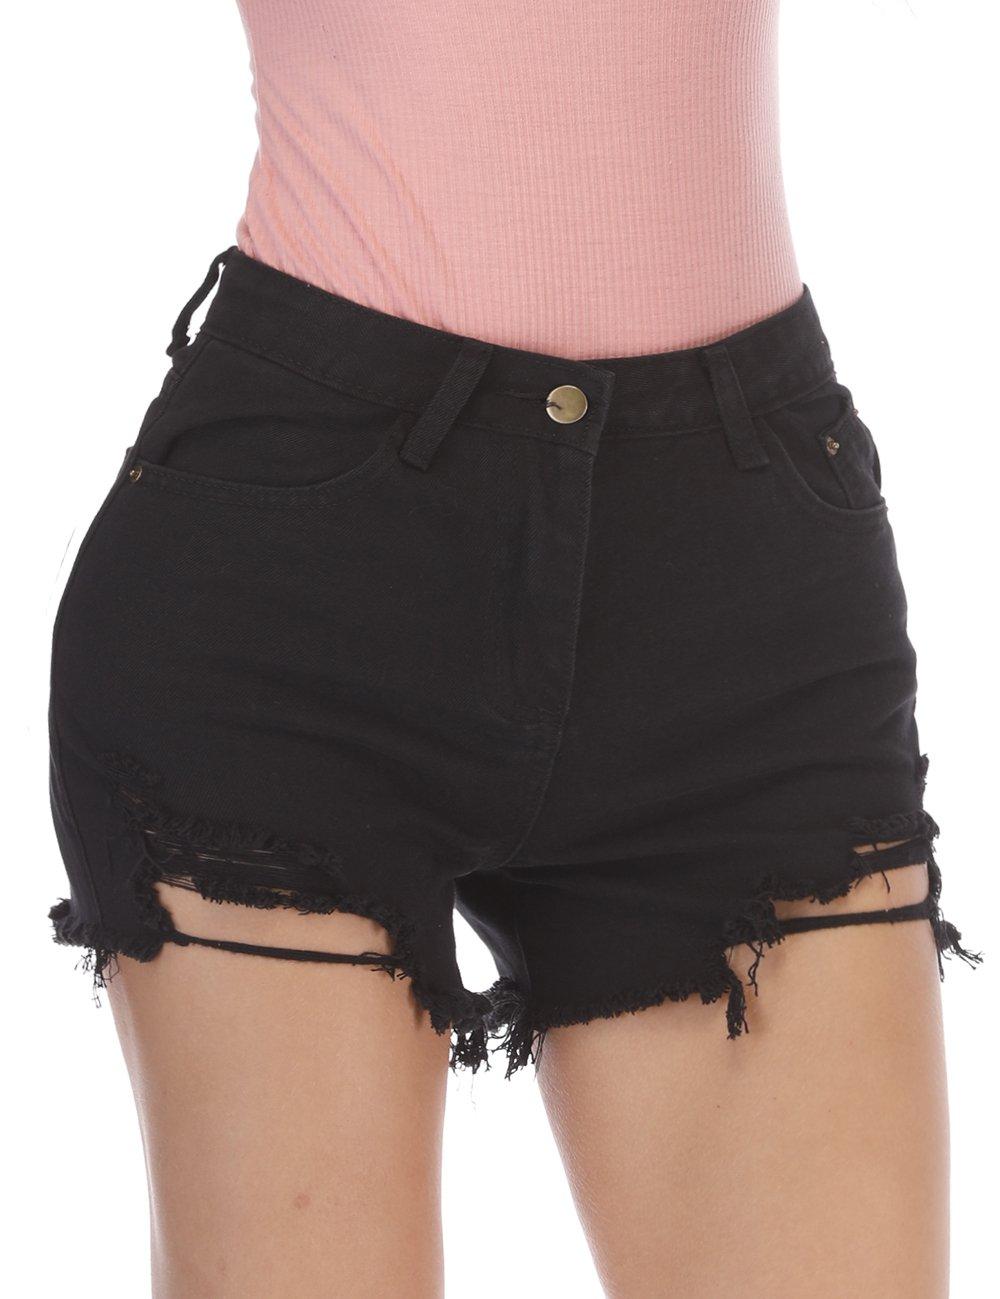 Women's Girls Juniors Summer Casual Basic Shorts High Waisted Distressed Strechy Ripped Jeans ShortsXL Black